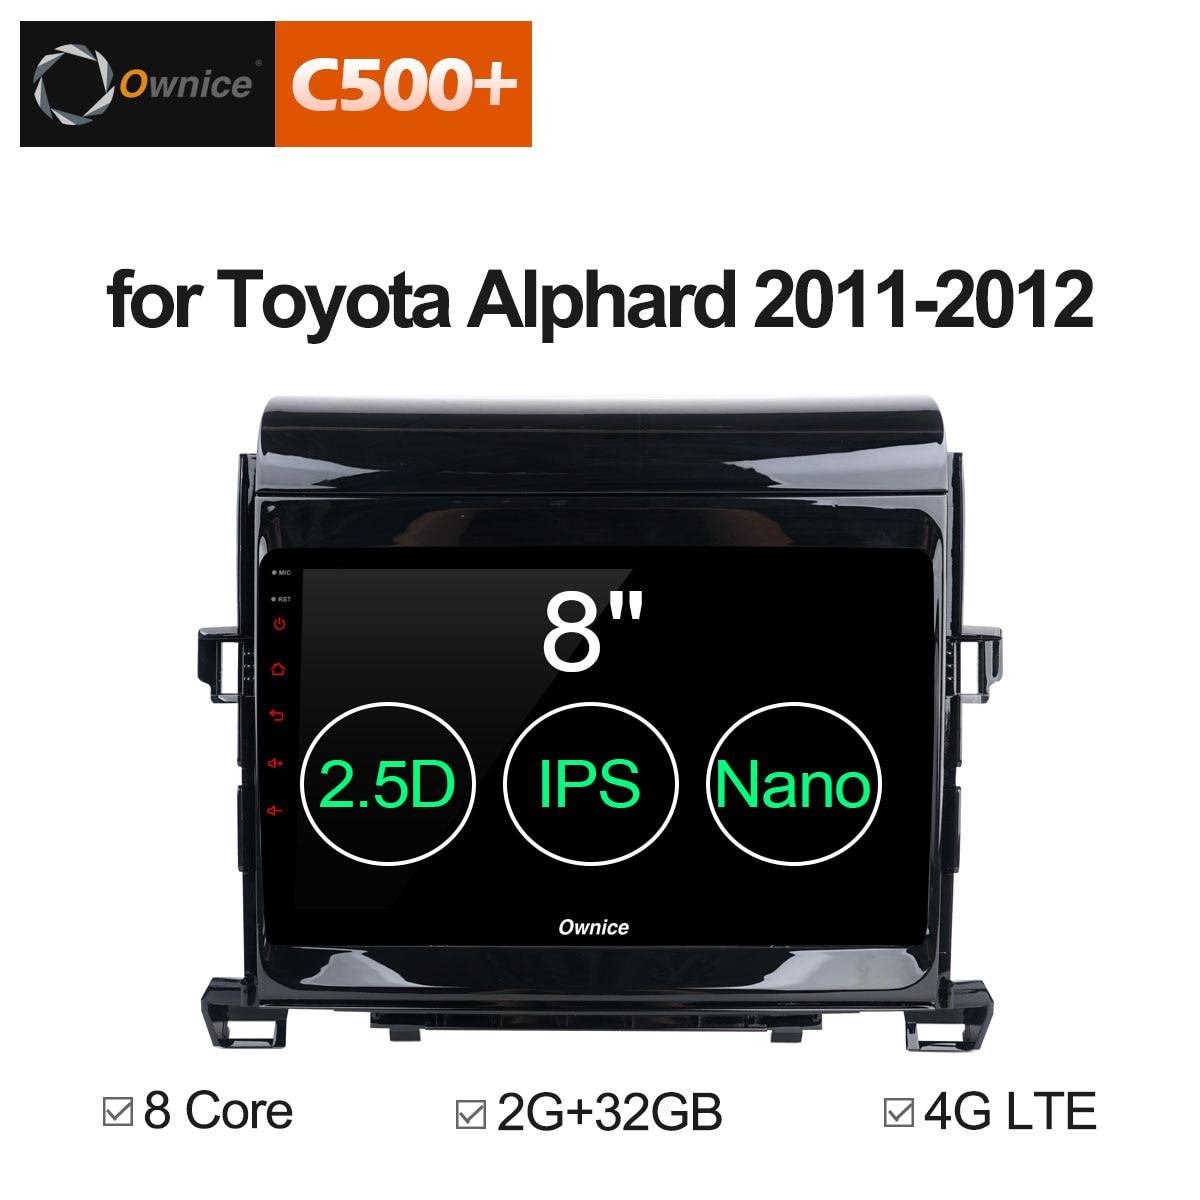 Ownice C500 + G10 pour Toyota Alphard/Vellfire 2011 2012 Android 8.1 autoradio lecteur CD DVD GPS Navi caméra de Navigation OBD 4G